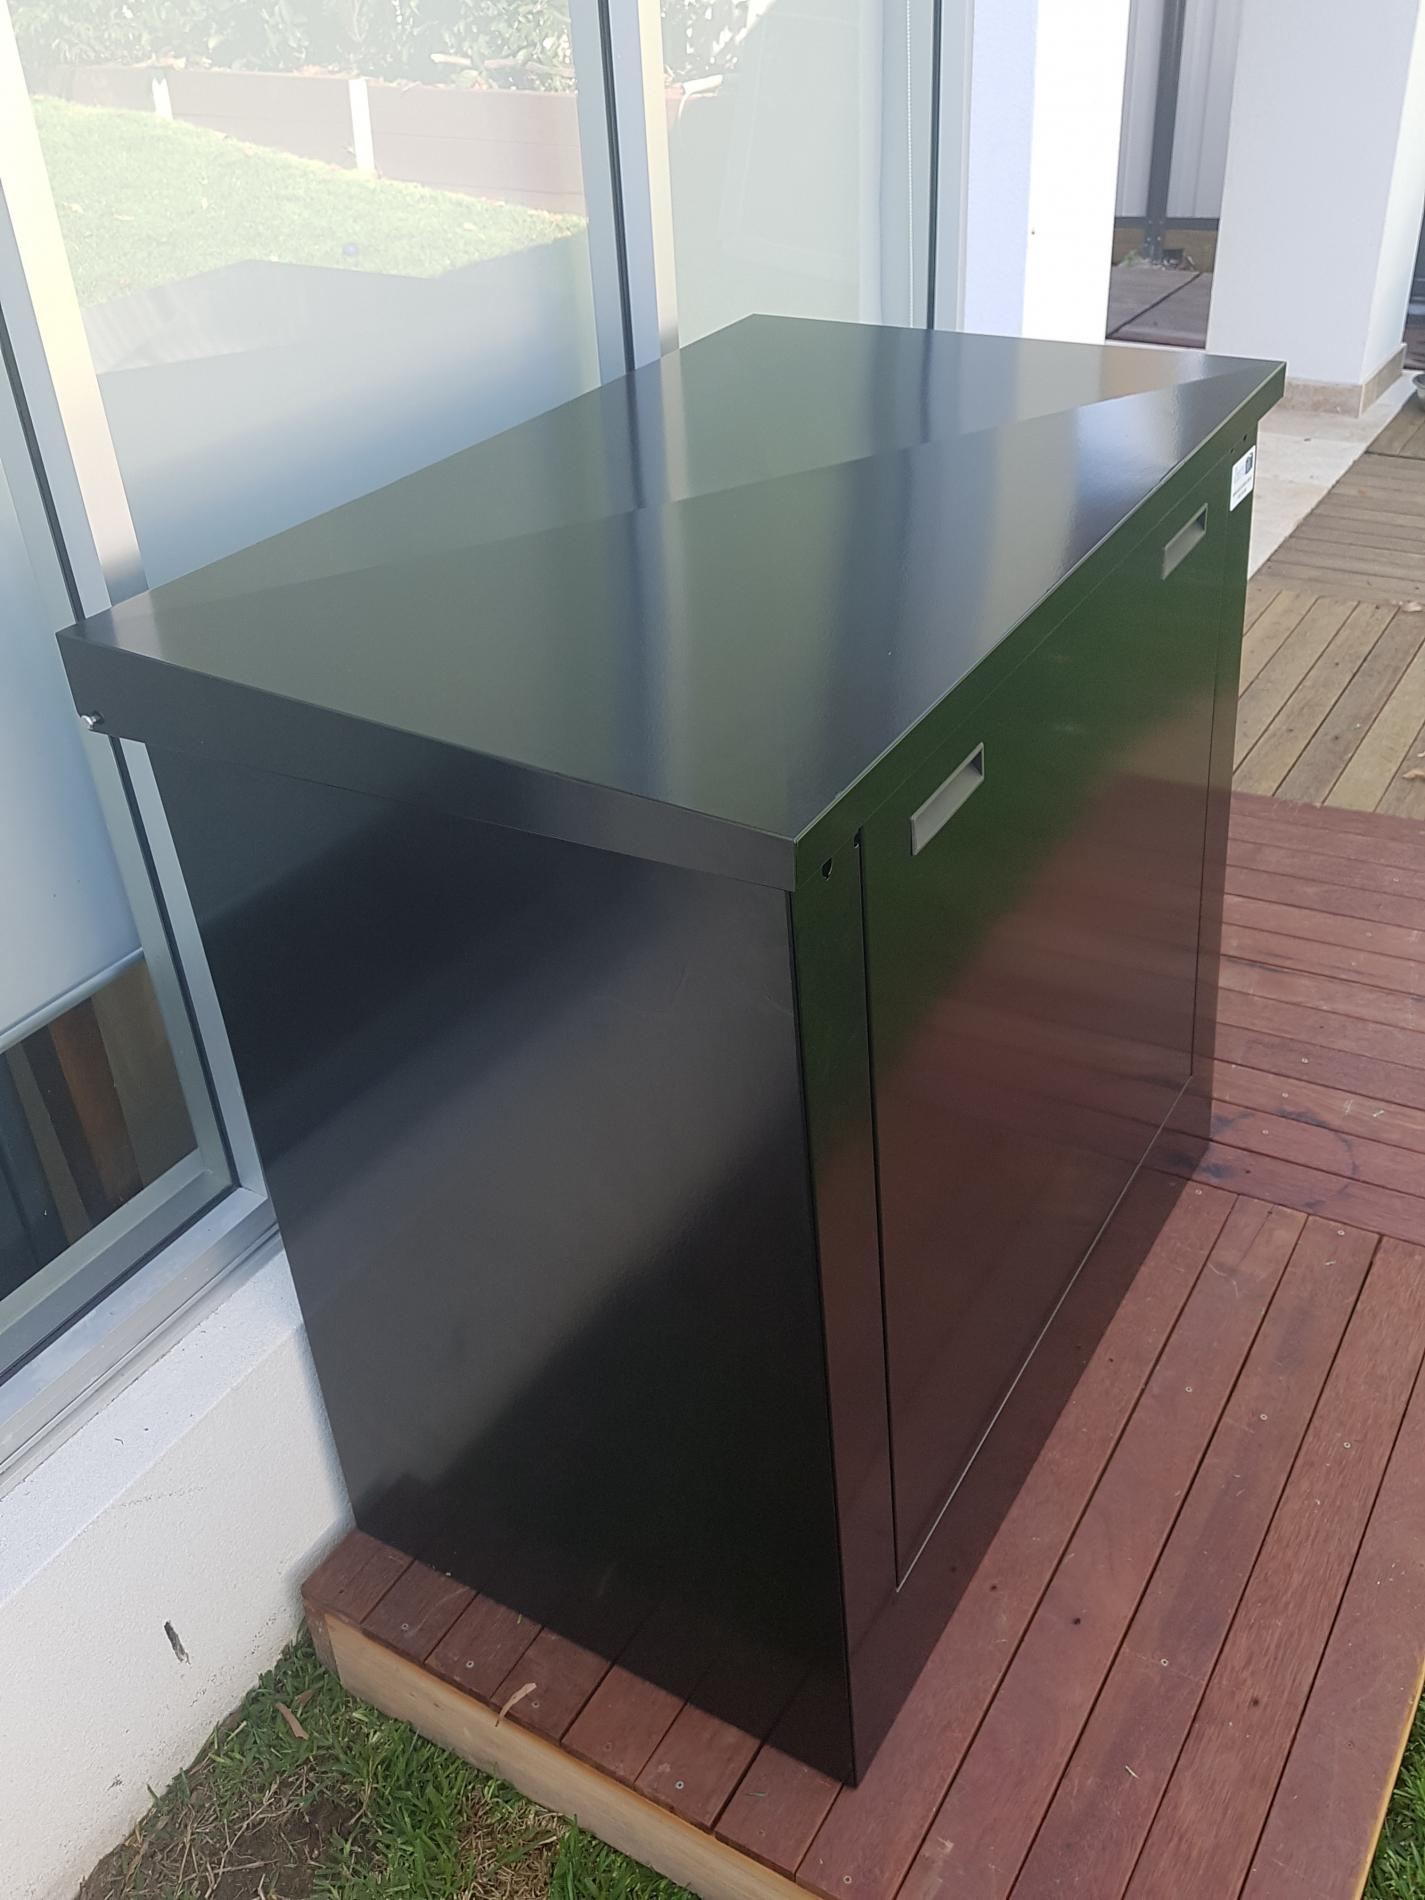 Slim small pool filter box